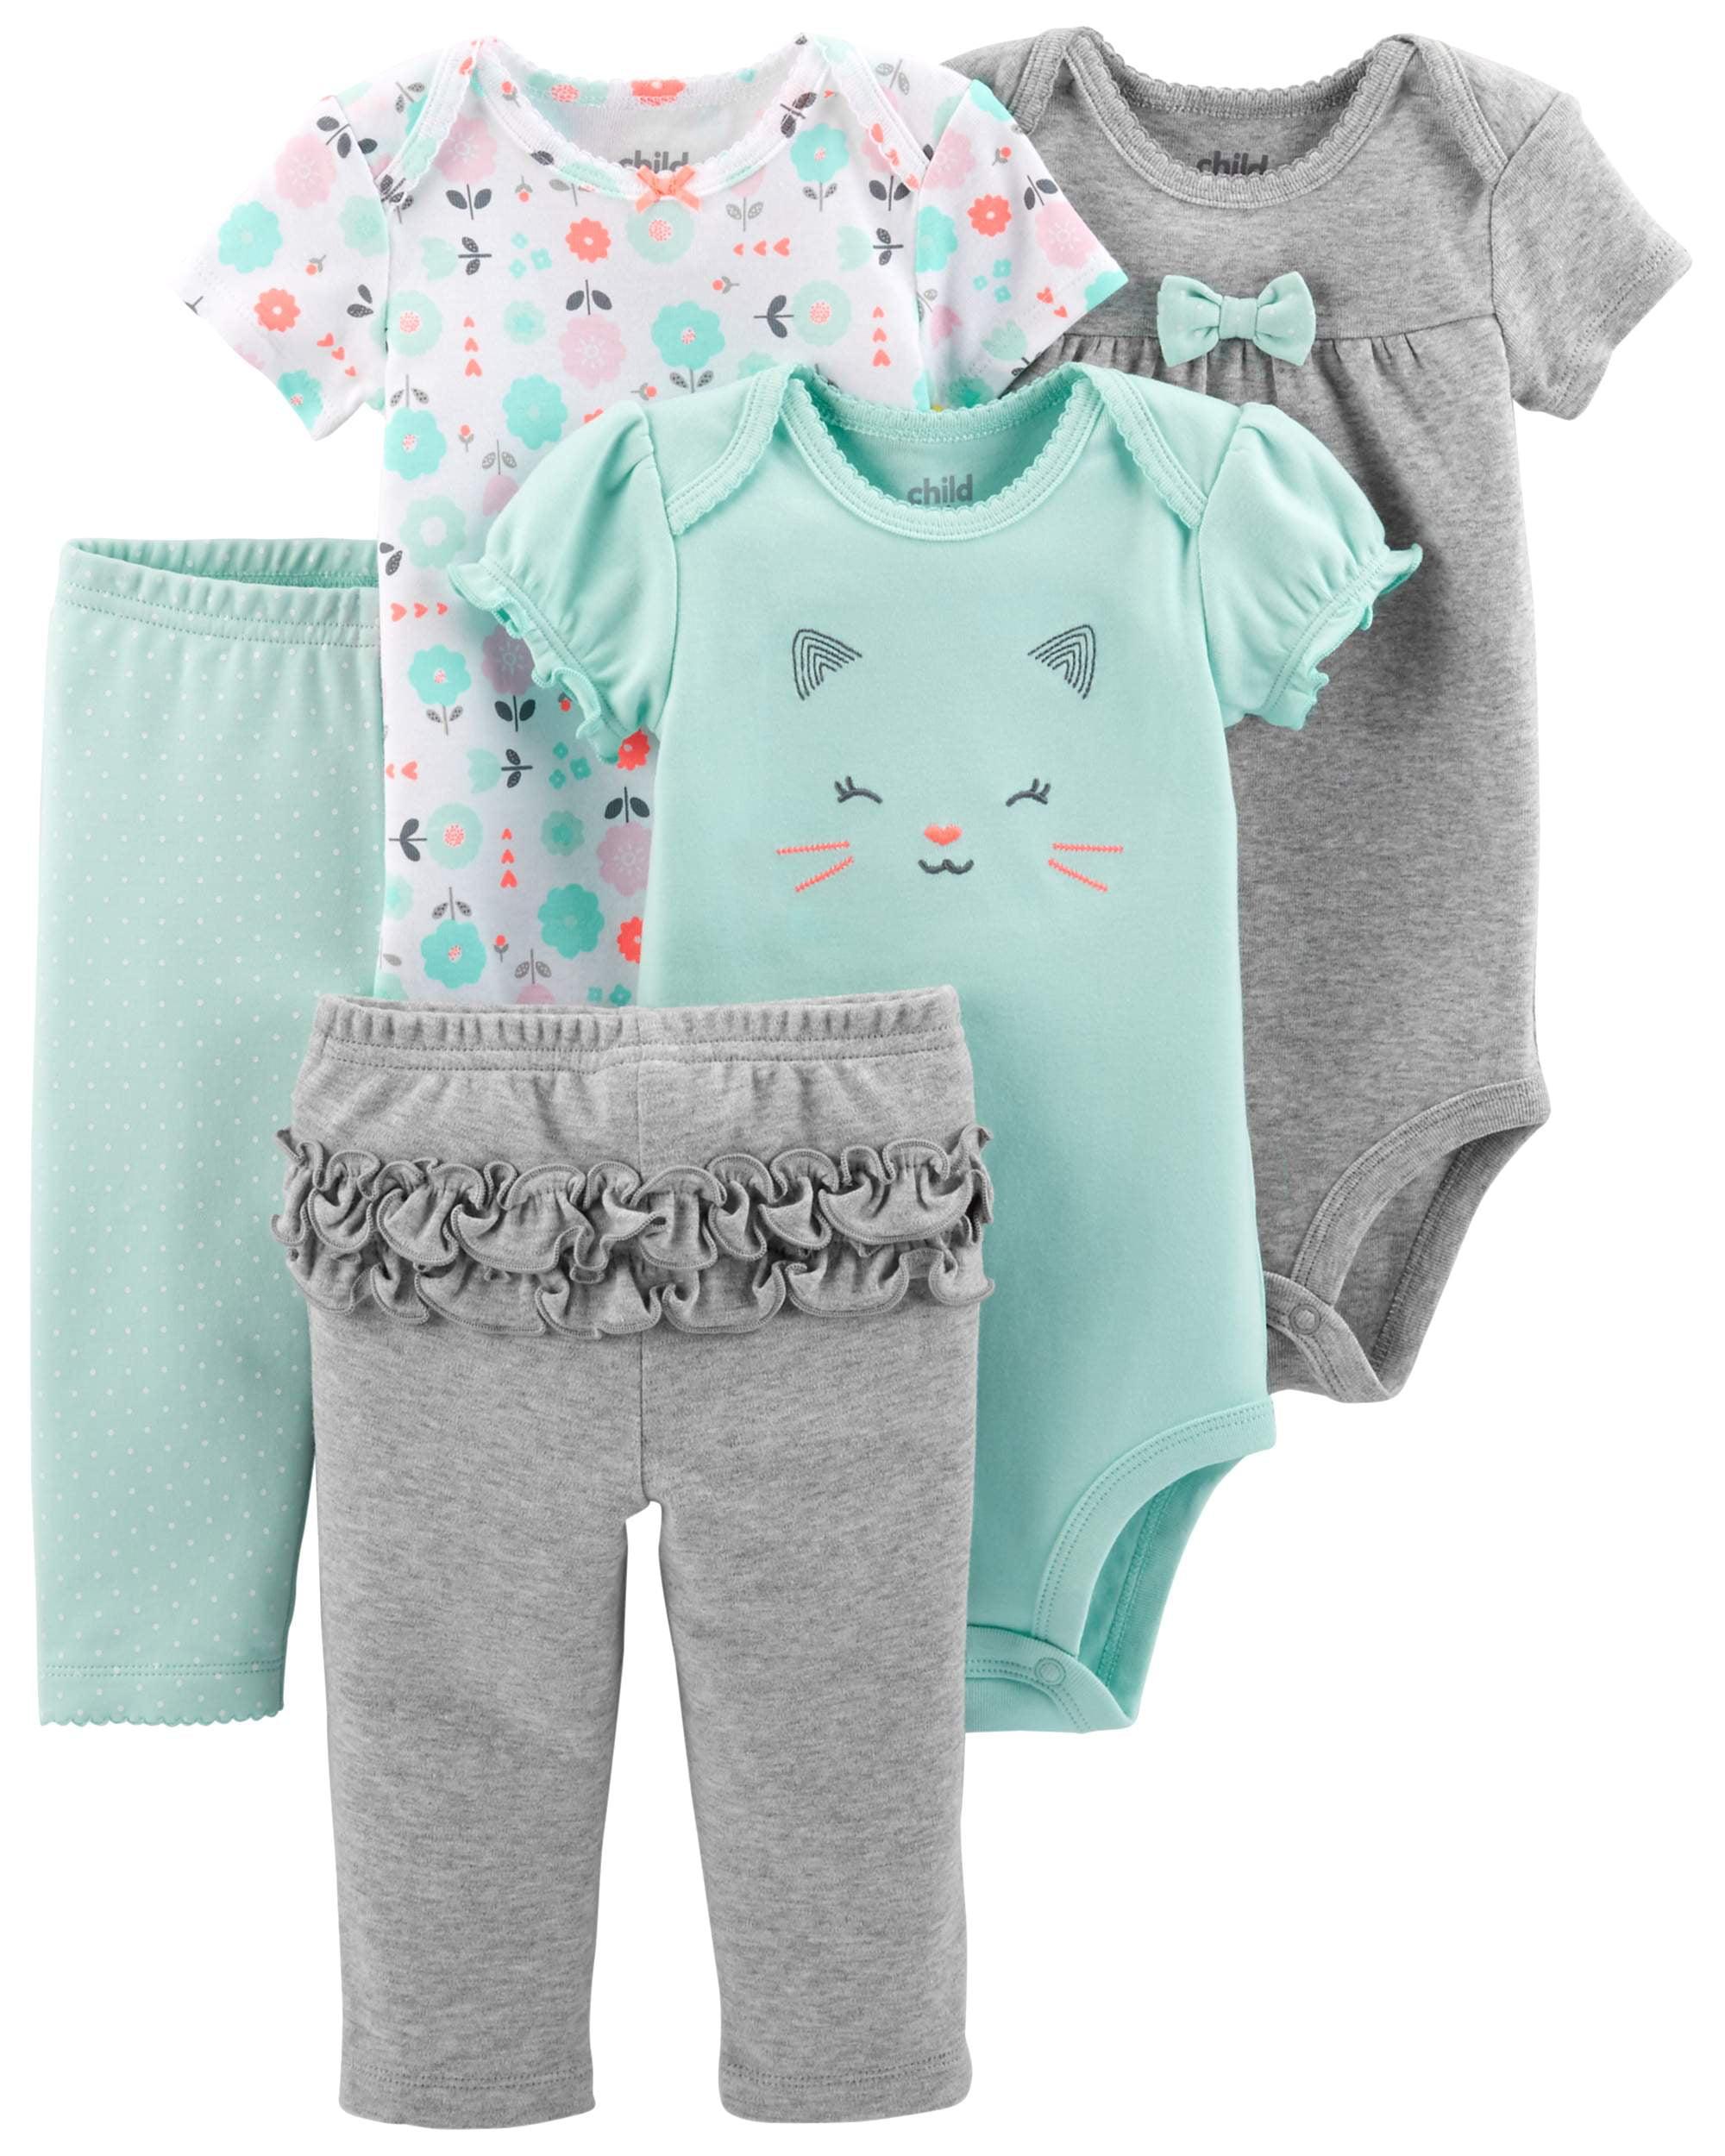 Short Sleeve Bodysuits & Pants, 5pc Set (Baby Girls)